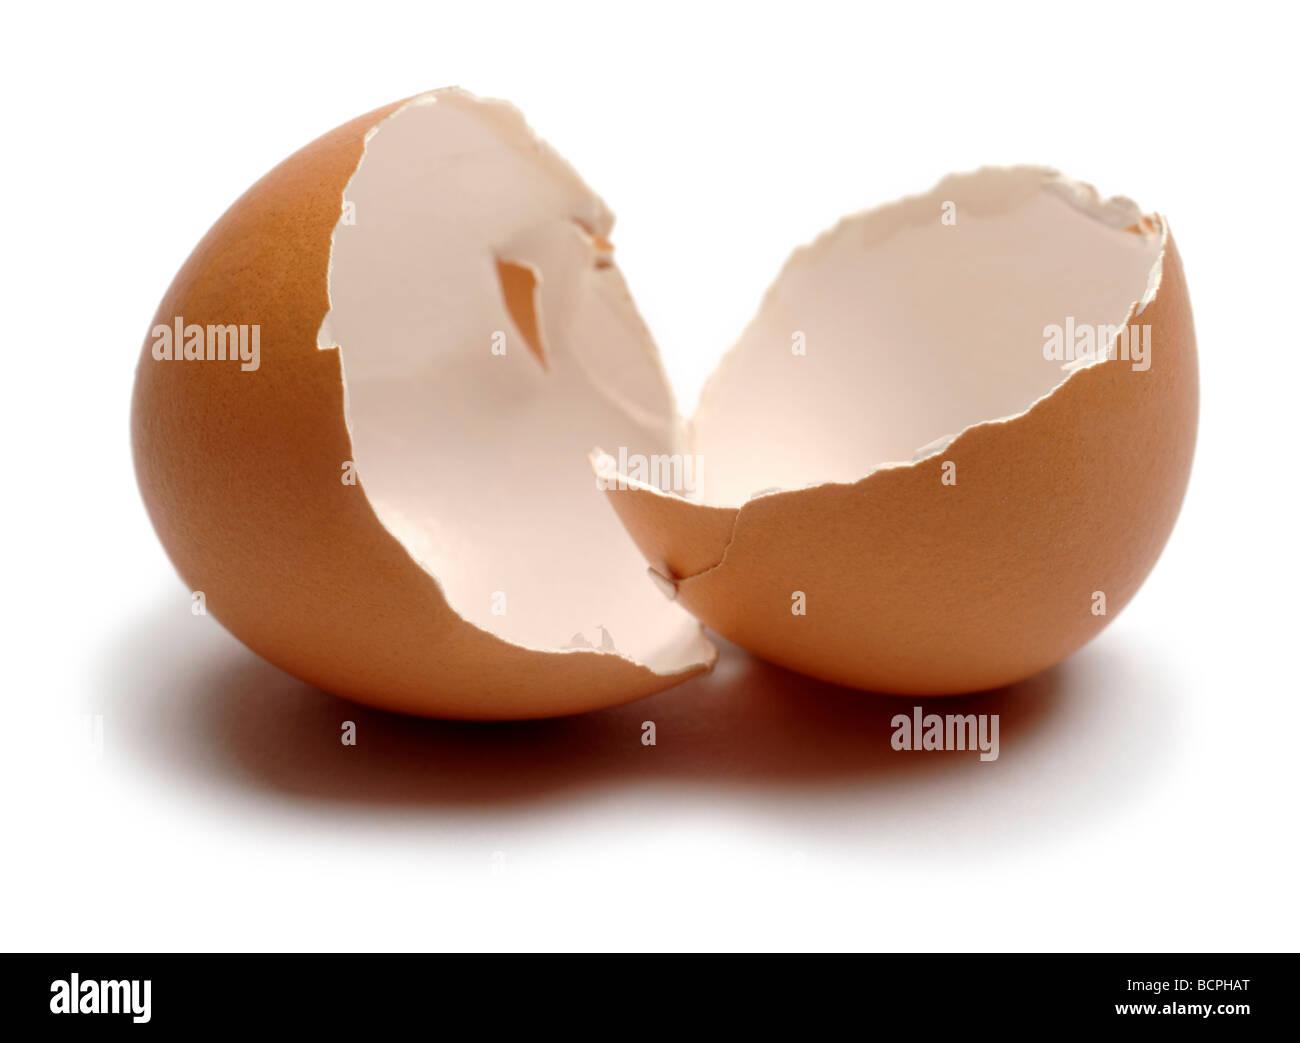 Cáscara de huevo Imagen De Stock